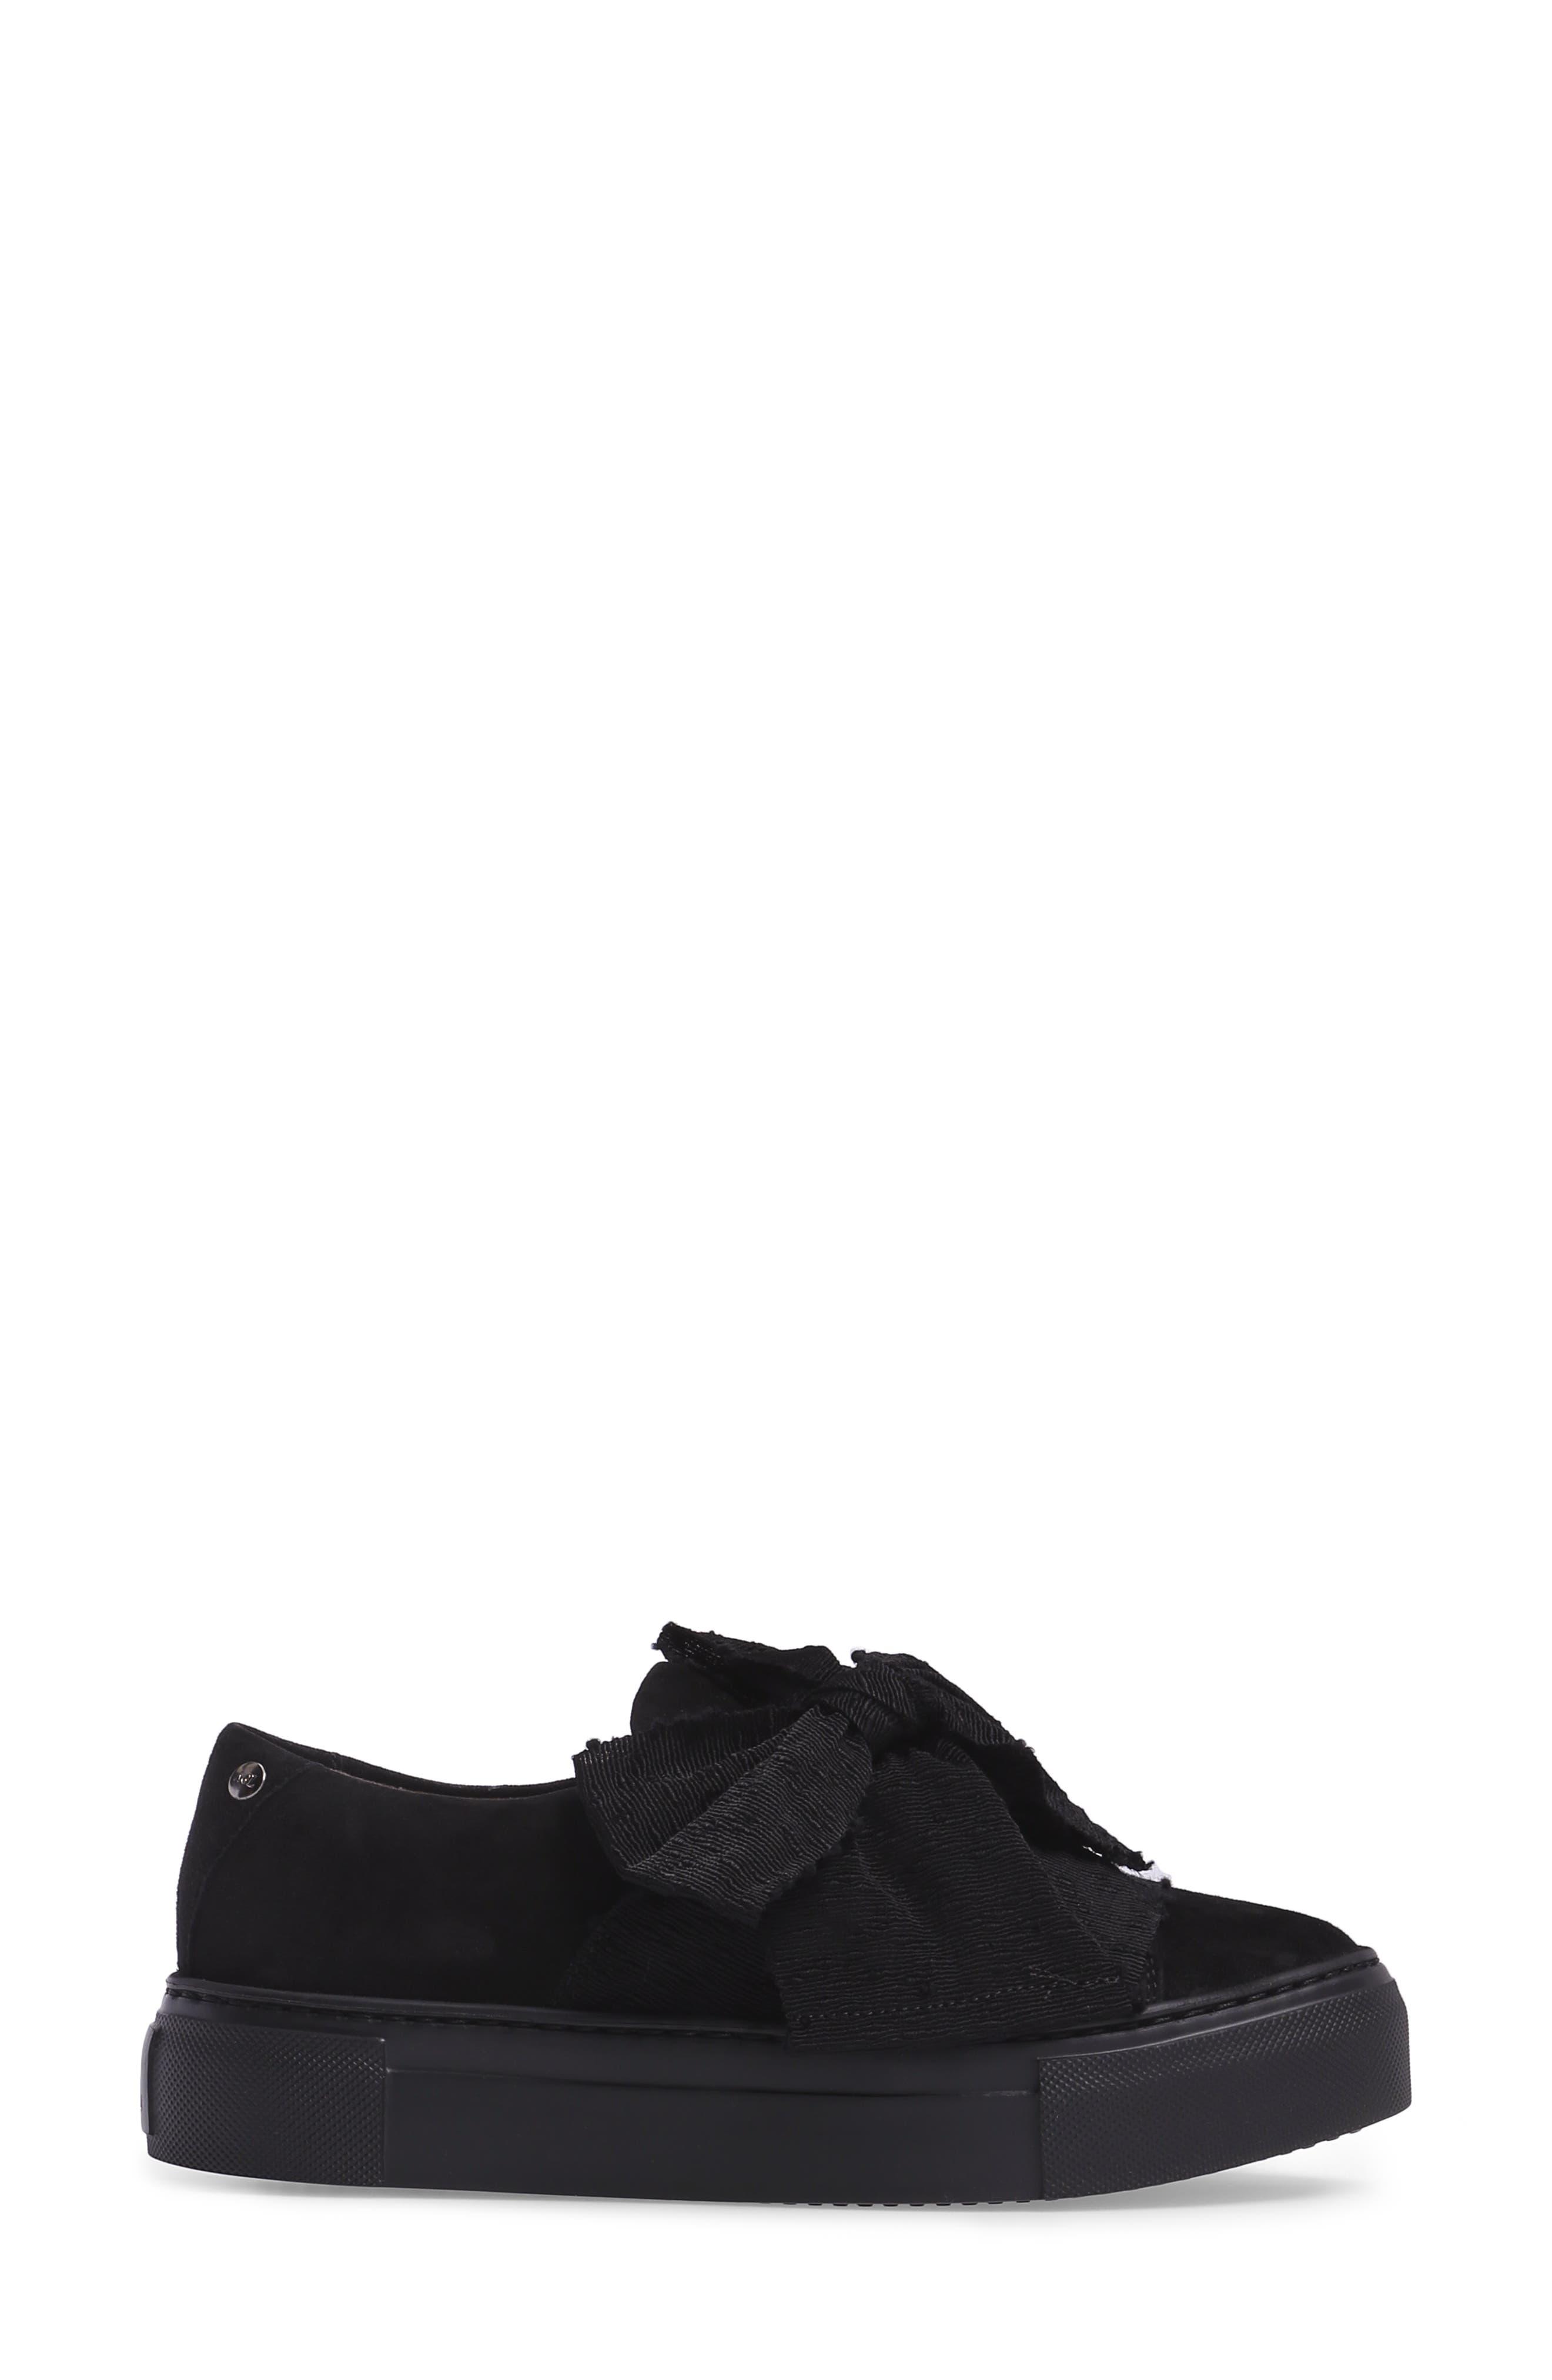 Alternate Image 3  - AGL Bow Platform Sneaker (Women)